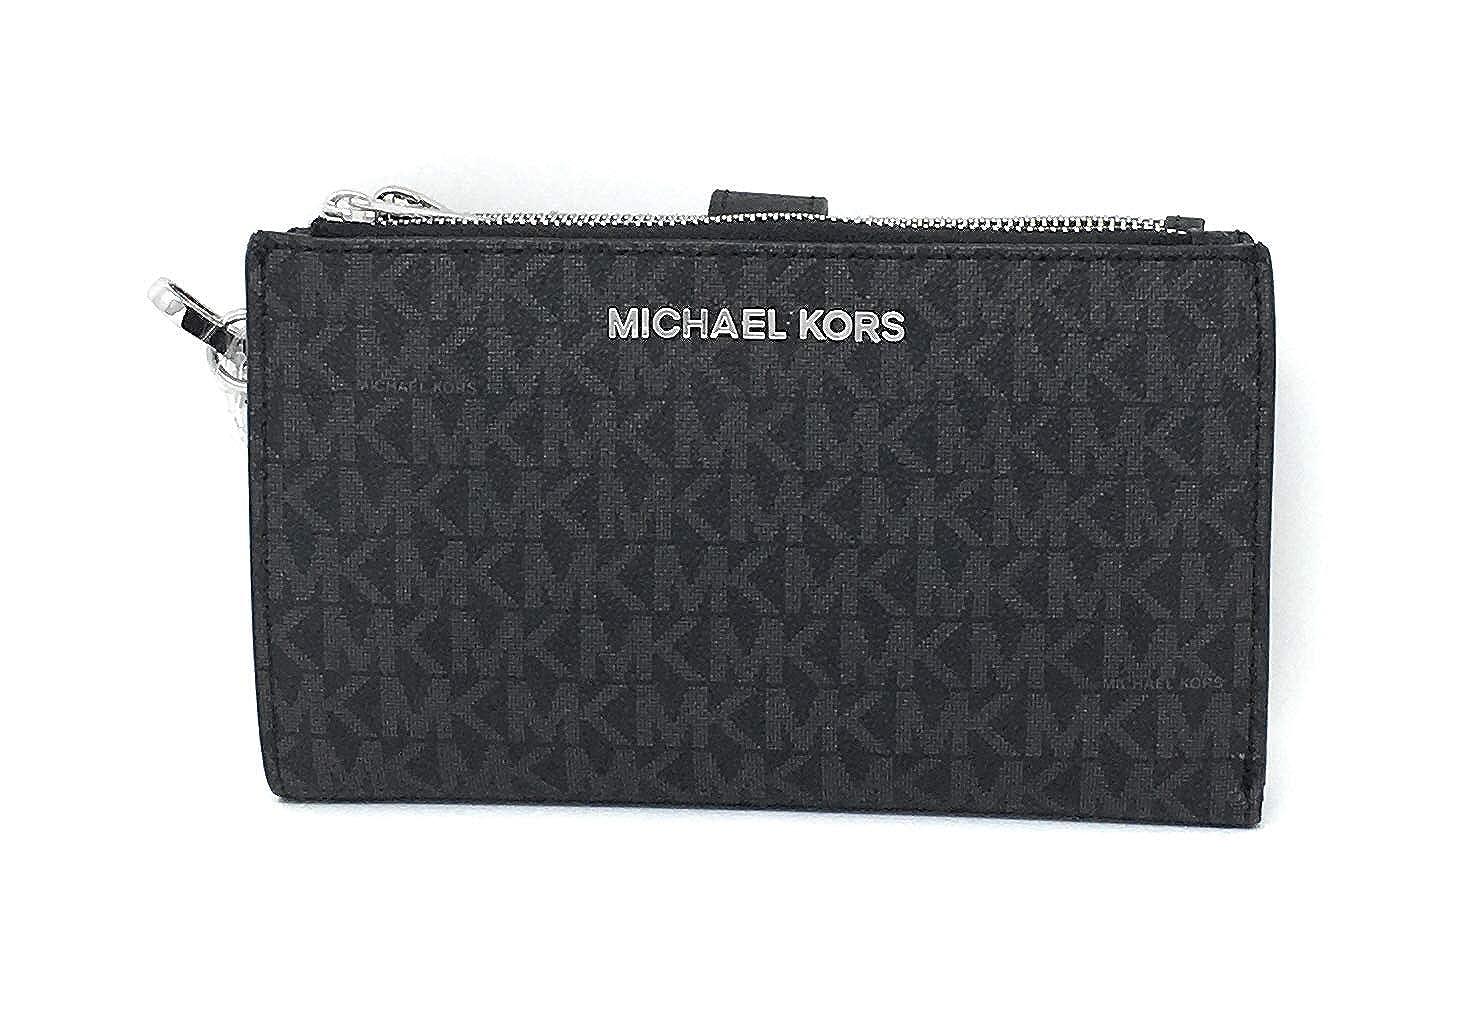 de412c8541b438 Michael Kors Jet Set Double Zip Wristlet Black PVC: Handbags: Amazon.com